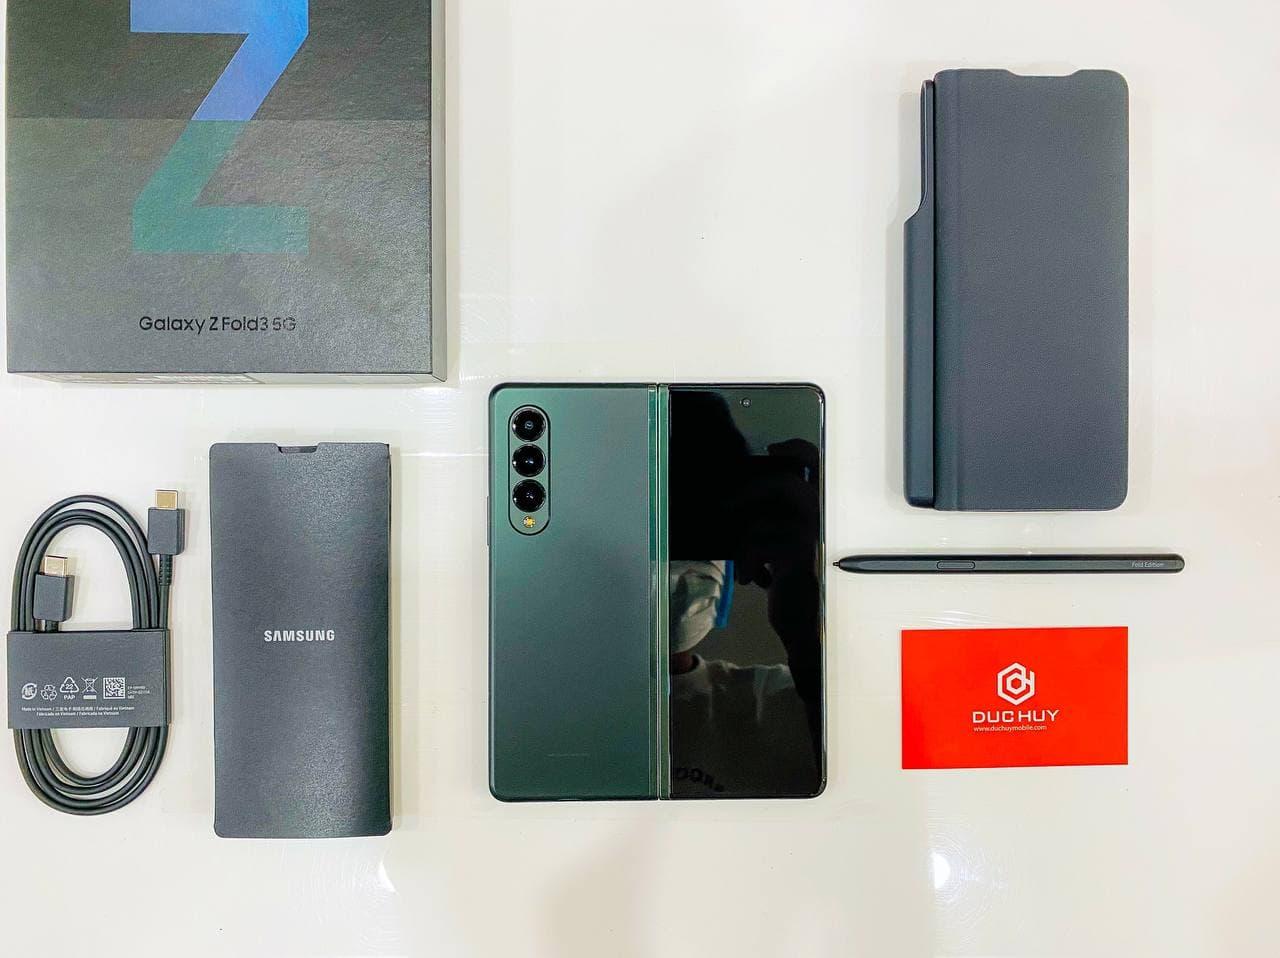 phụ kiện Samsung Galaxy Z Fold 3 5G 512GB